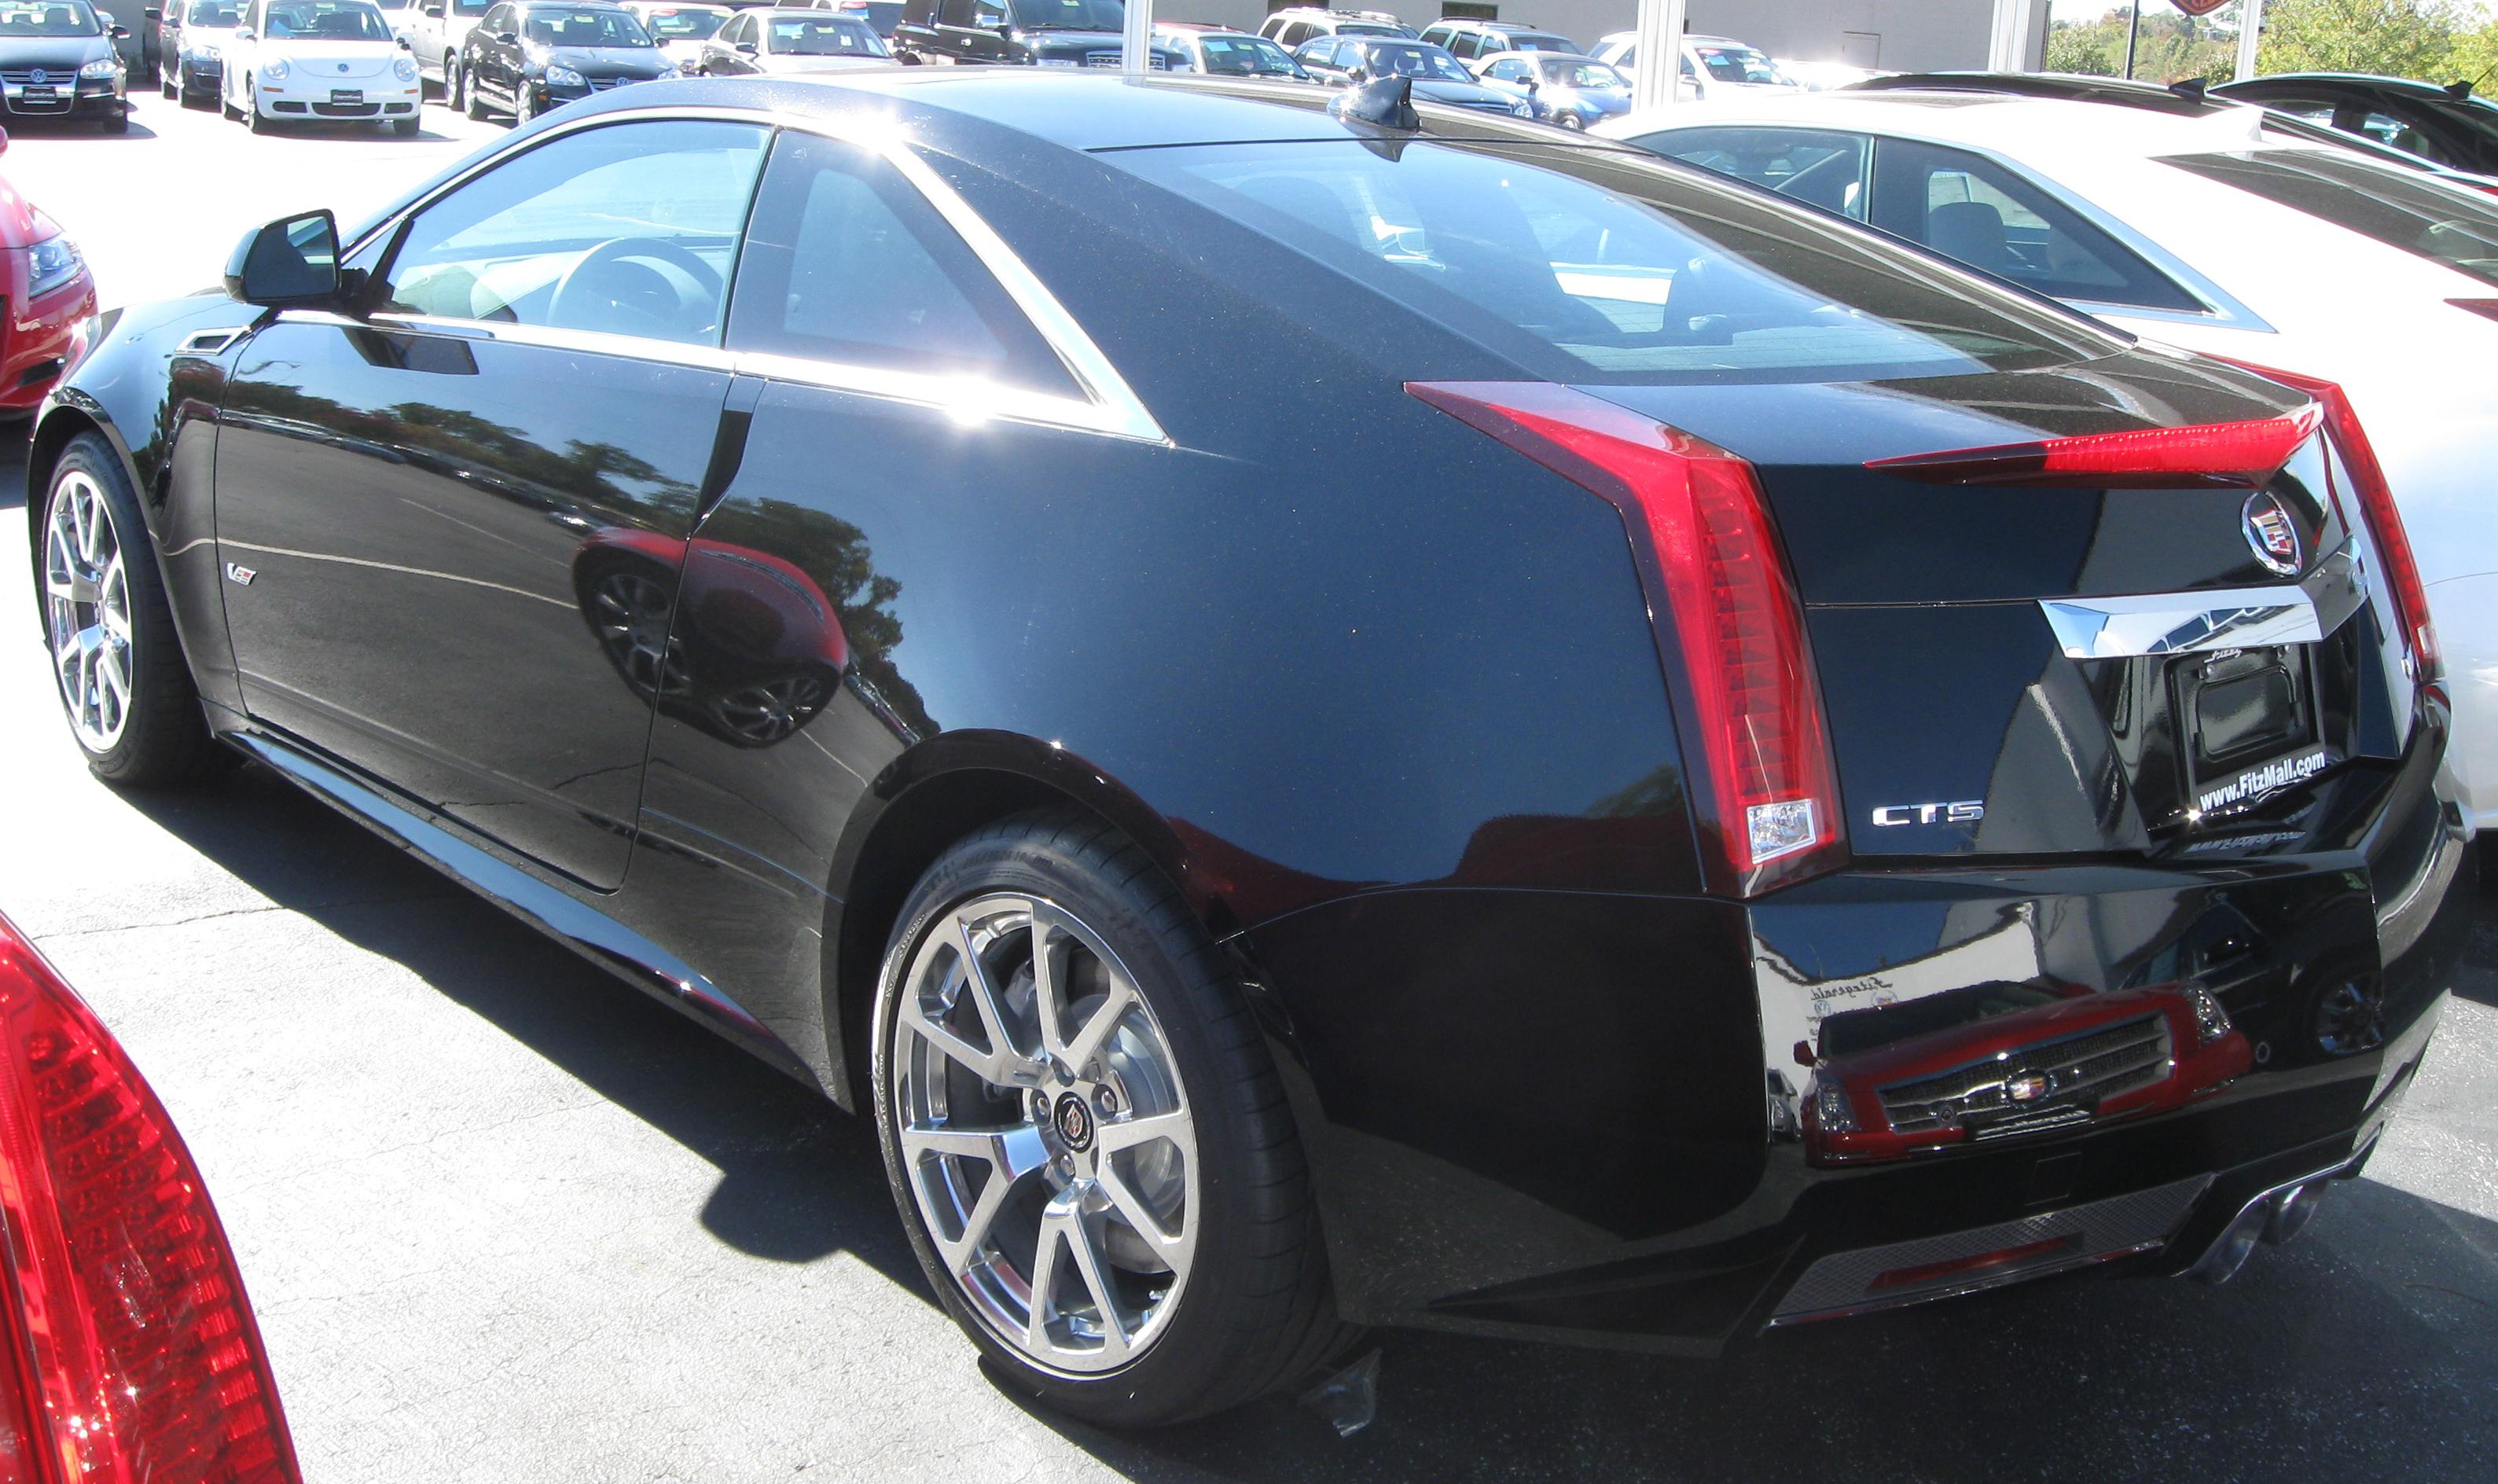 File 2011 Cadillac Cts V Coupe Rear 10 22 2010 Jpg Wikimedia